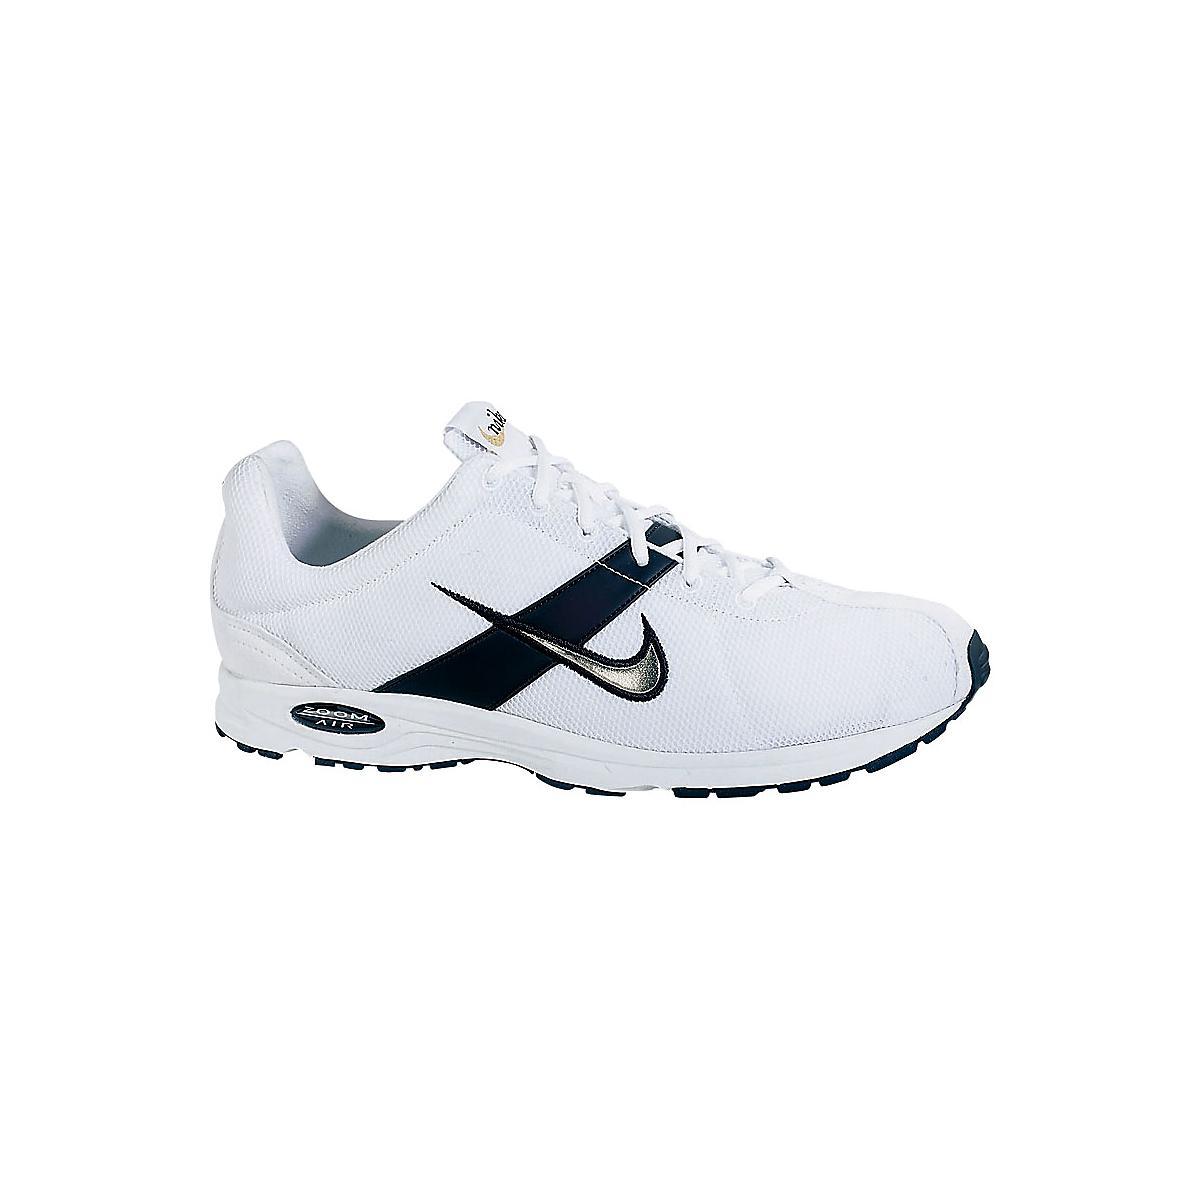 a4462ff758c1 Nike Zoom Streak XC Racing Shoe at Road Runner Sports